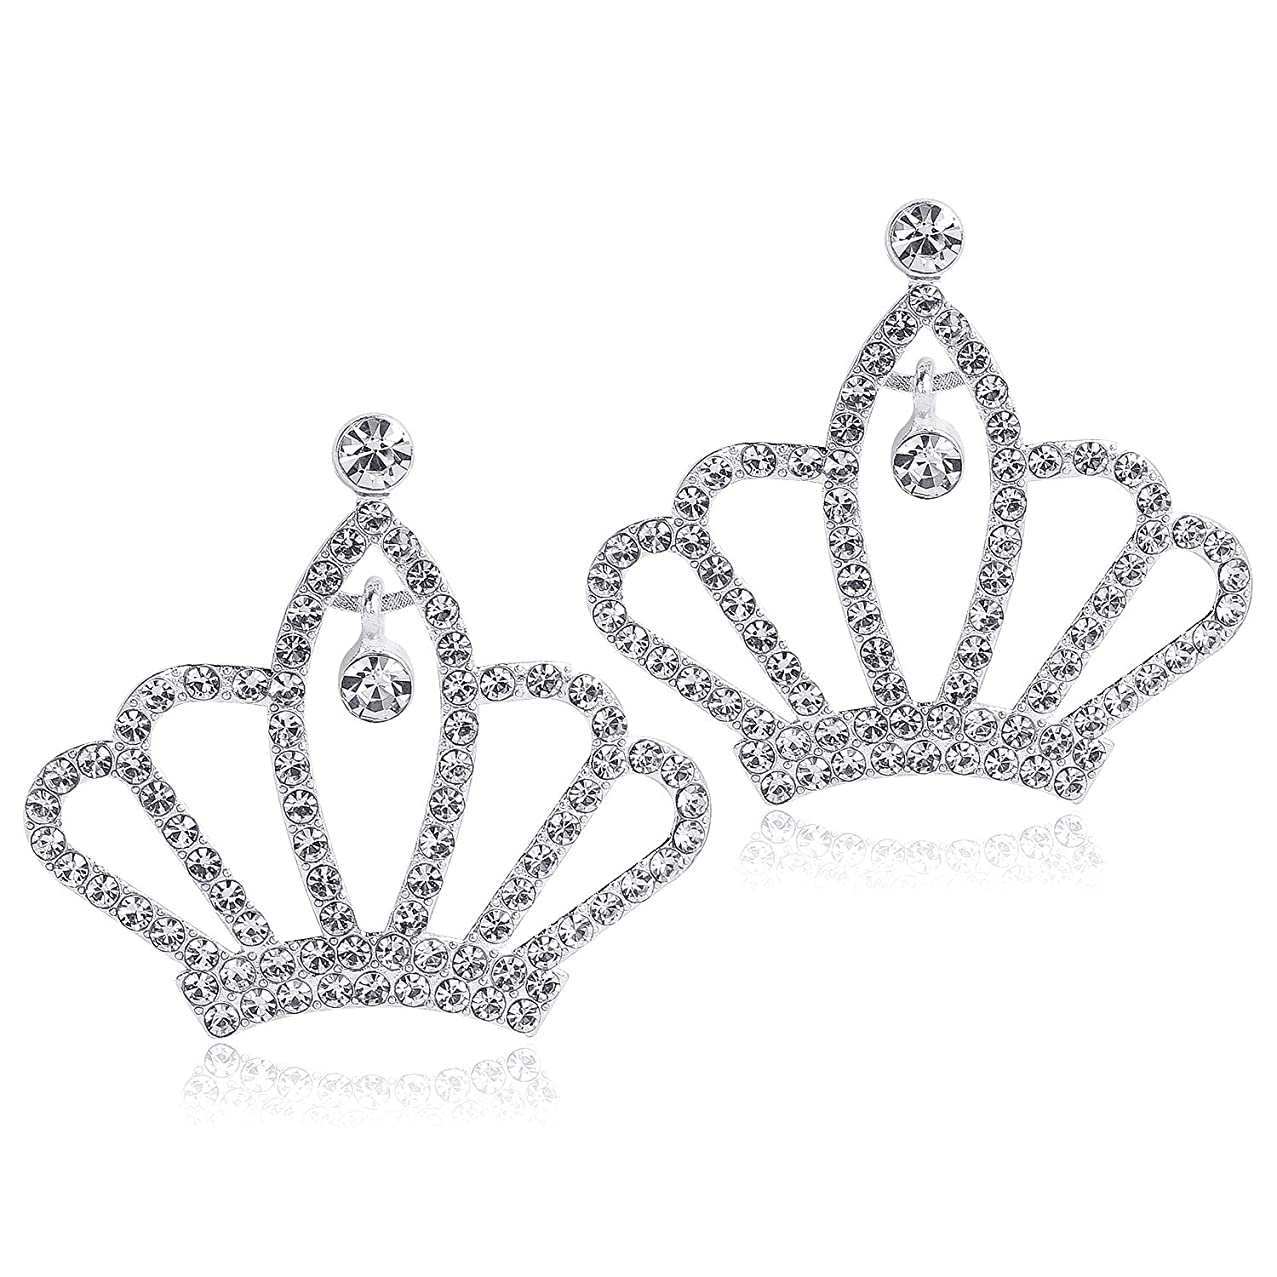 DIY-SHINNY 10 Pcs Girl Princess Rhinestone Tiara Crown Use for Wedding Decoration, Princess Party Favors, Tiaras for Girls and DIY Embellishments(Silver)